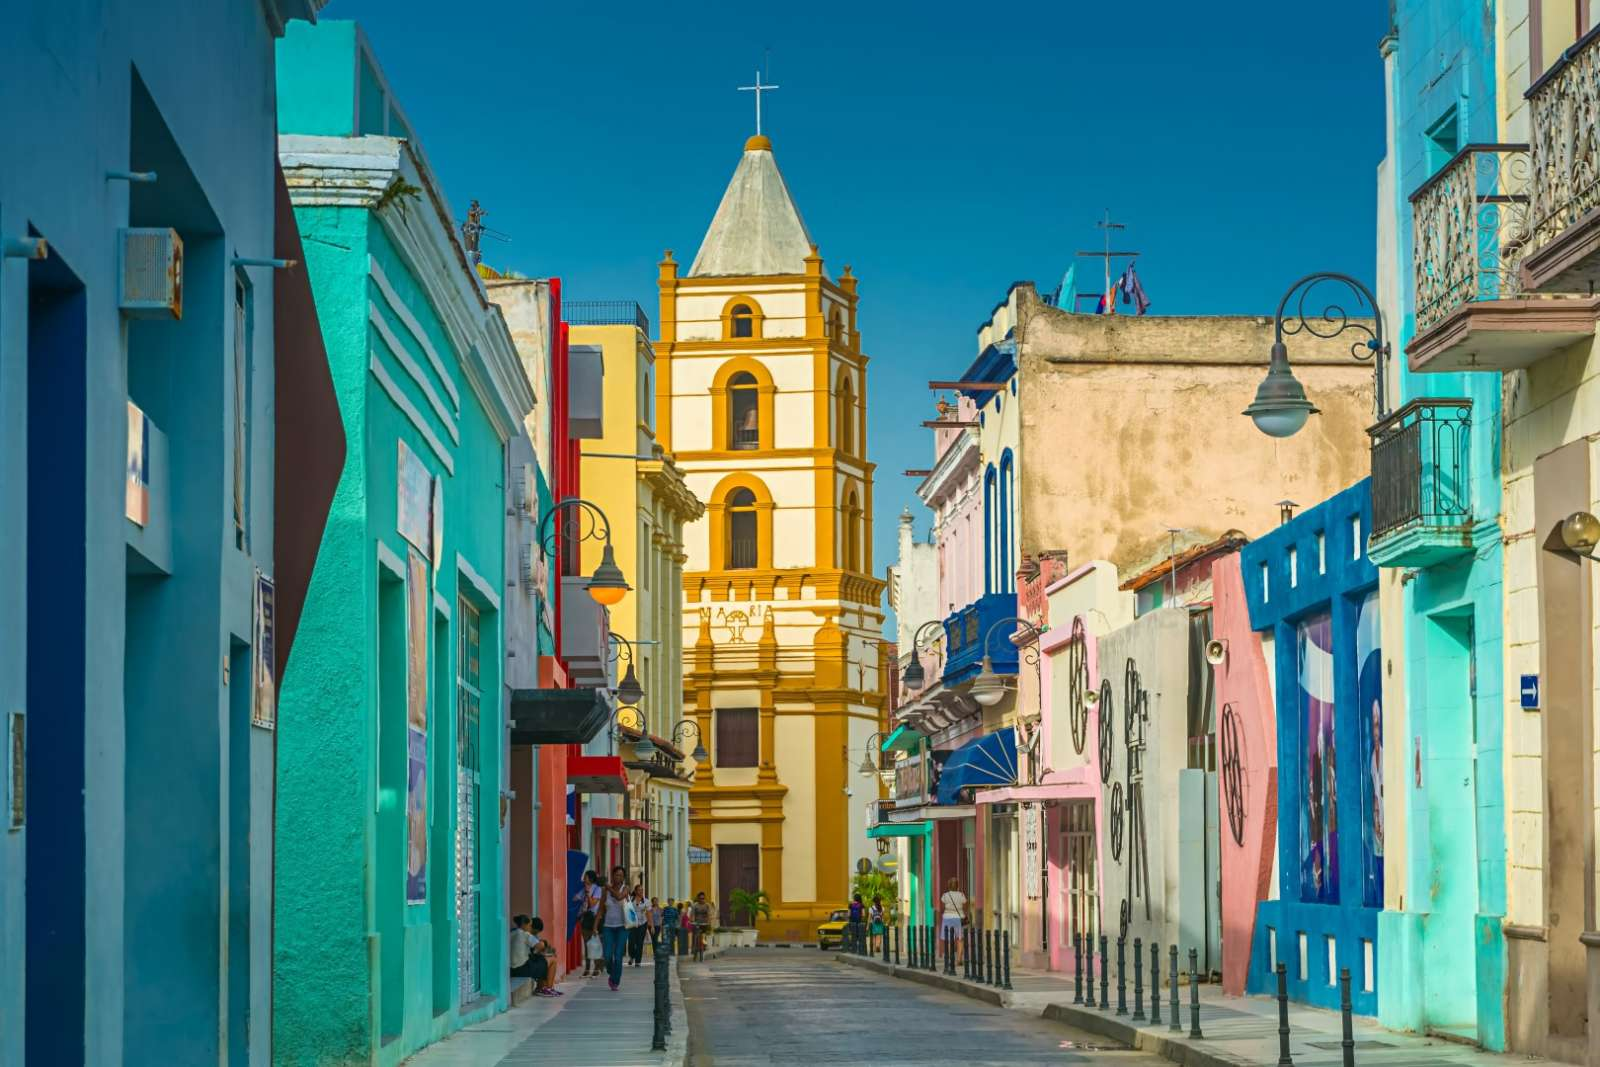 Colourful Ignacio Agramonte street in Camagüey, Cuba